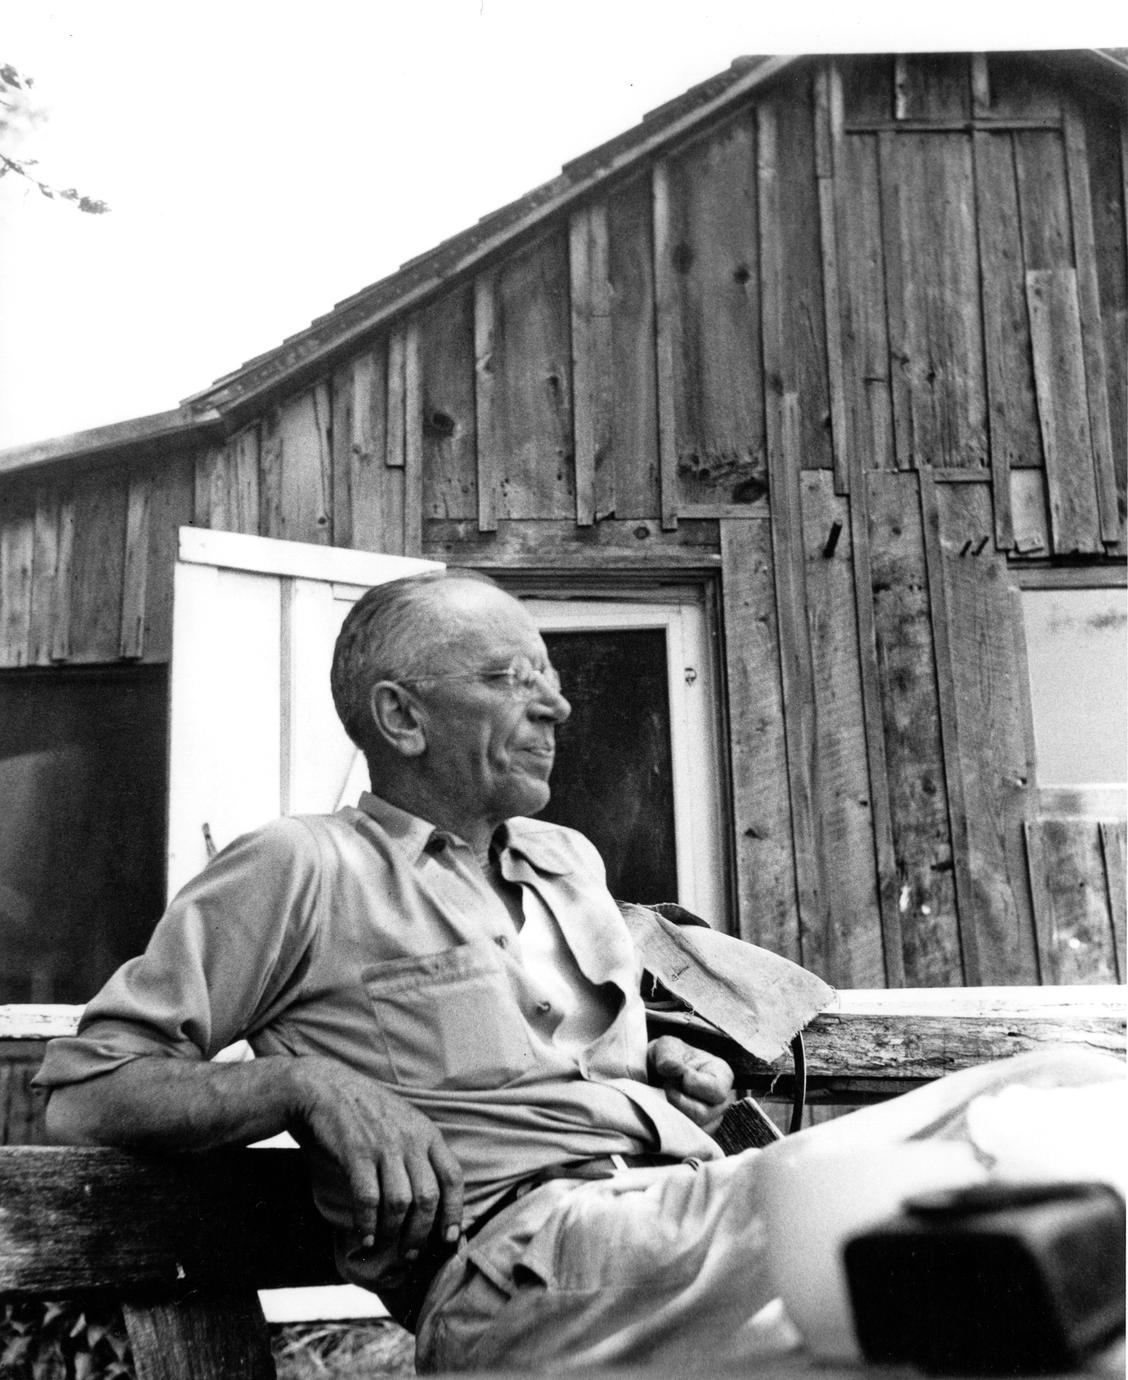 Aldo Leopold at the shack